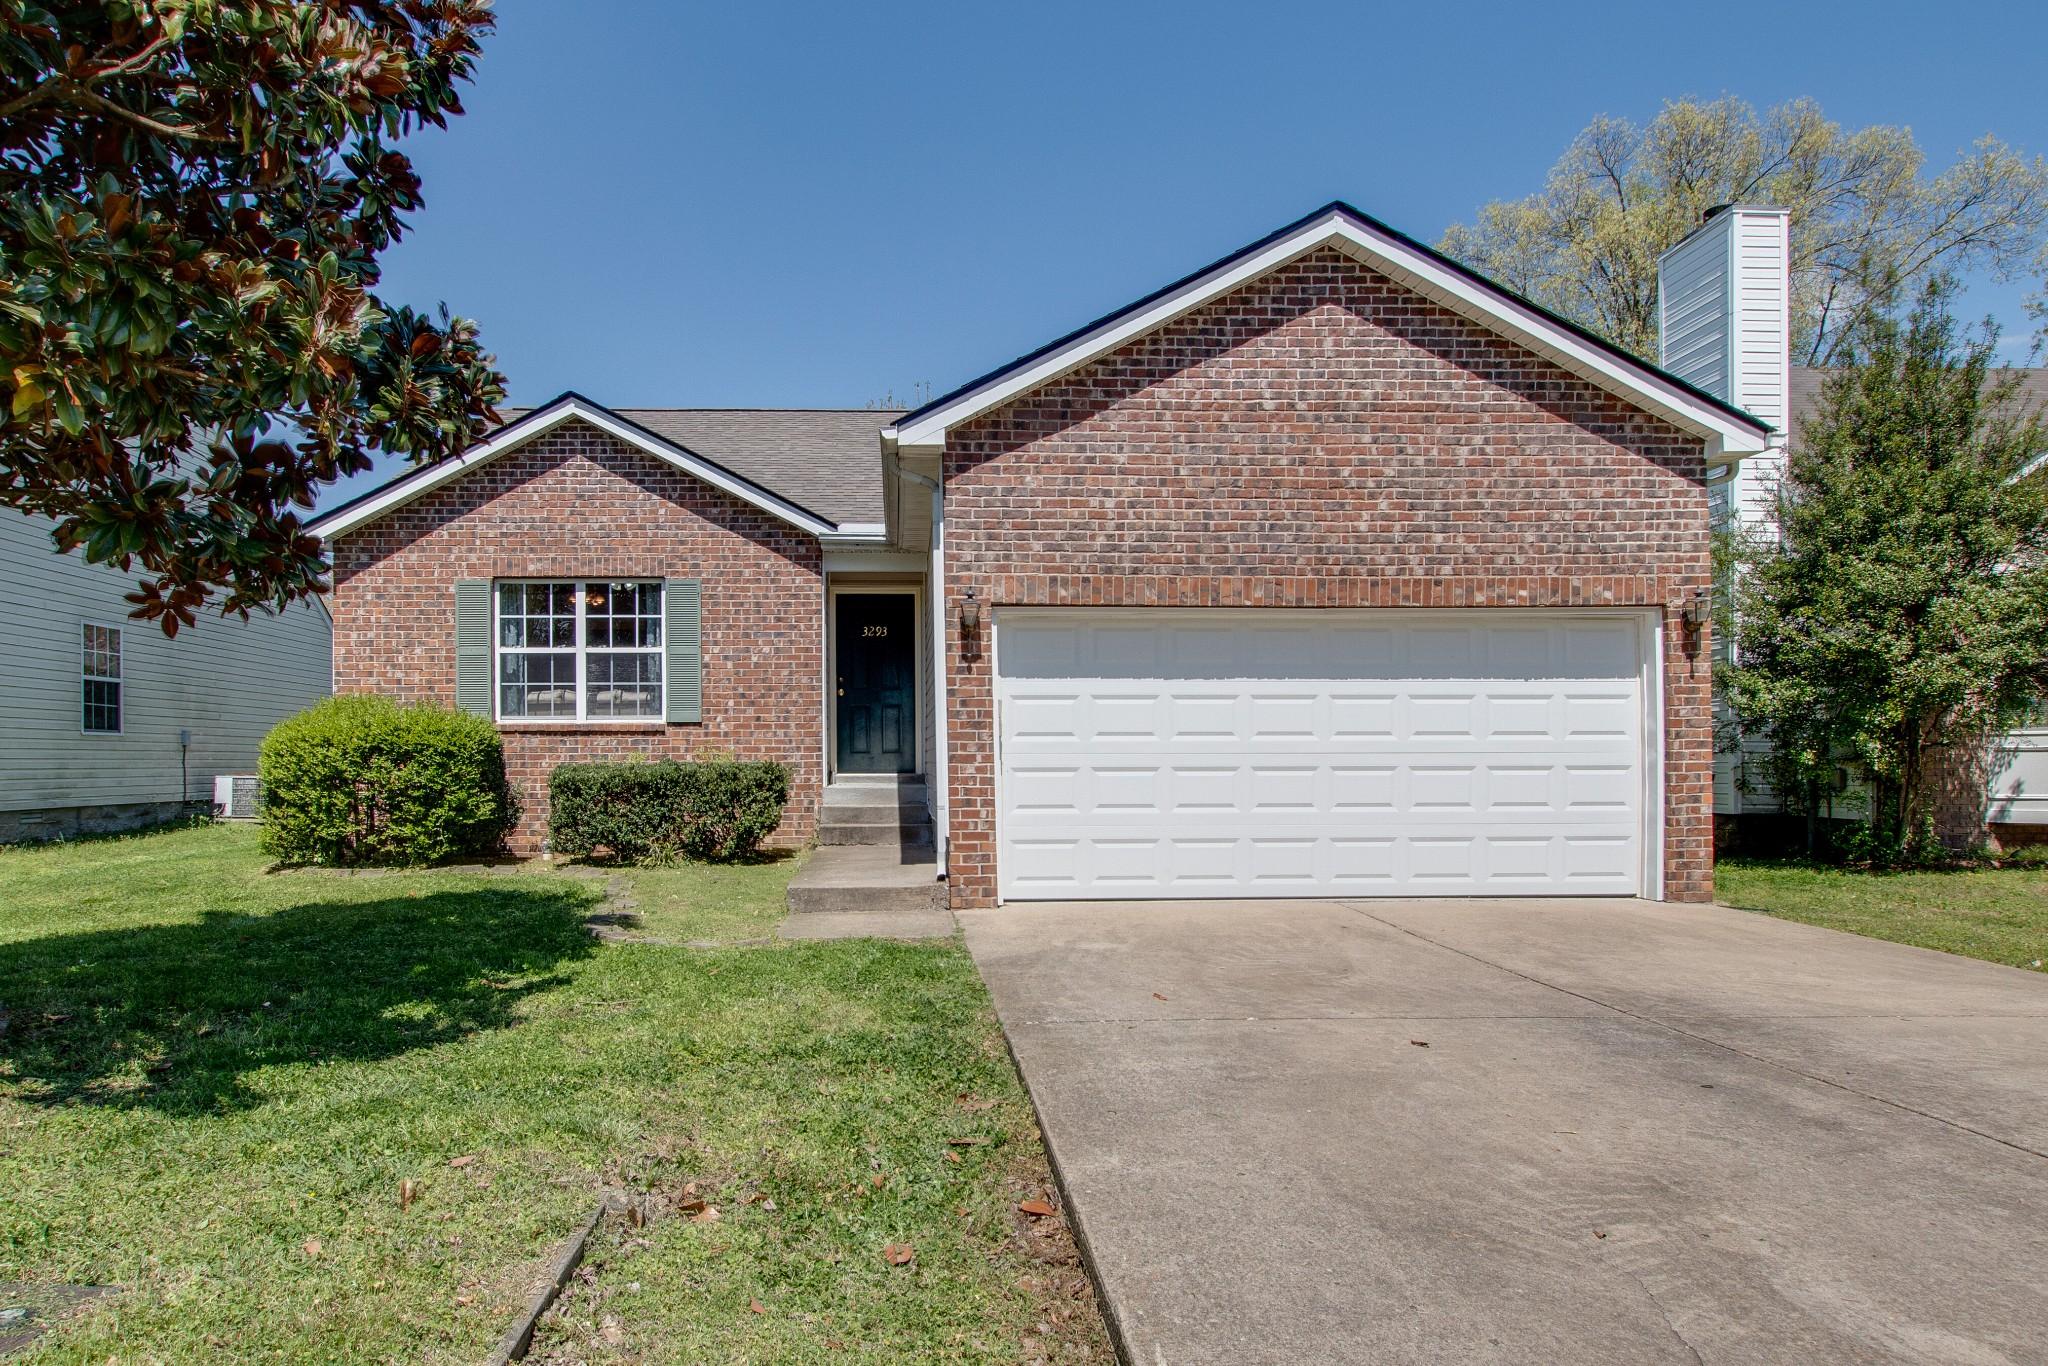 3293 Cain Harbor Dr Property Photo - Nashville, TN real estate listing